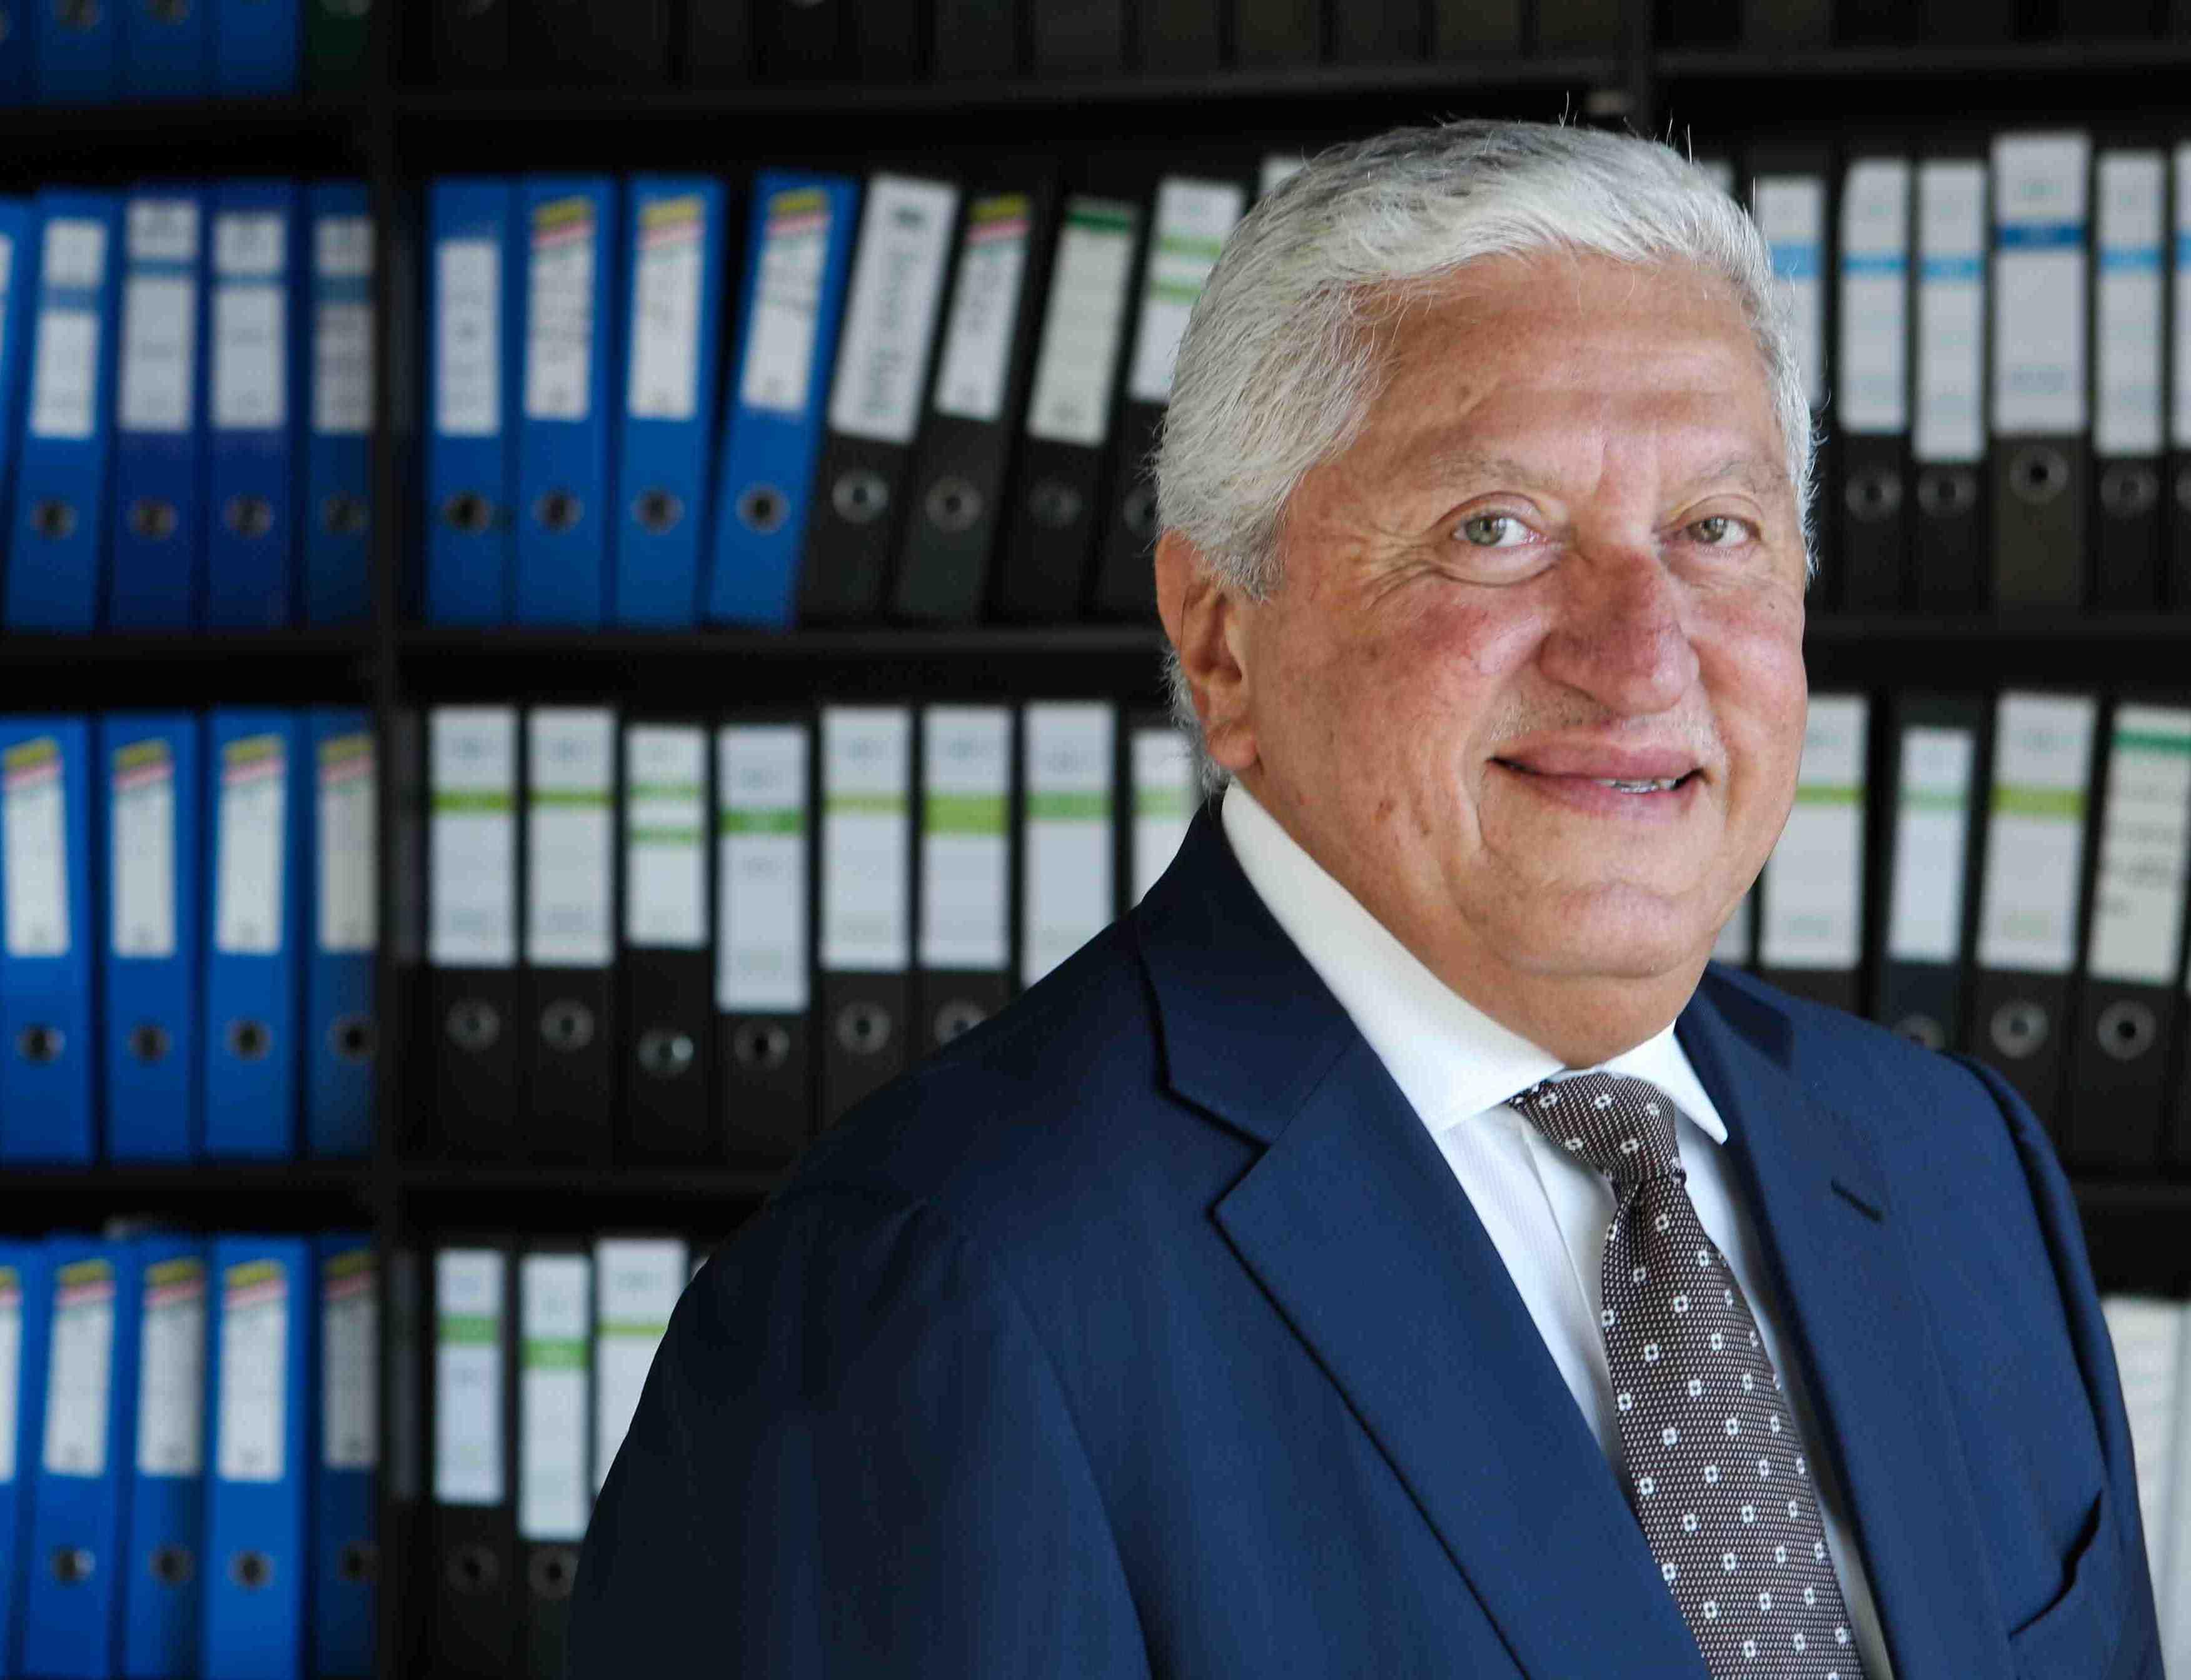 Exclusive: GCC Construction Market Down Says Drake & Scull's Tabari